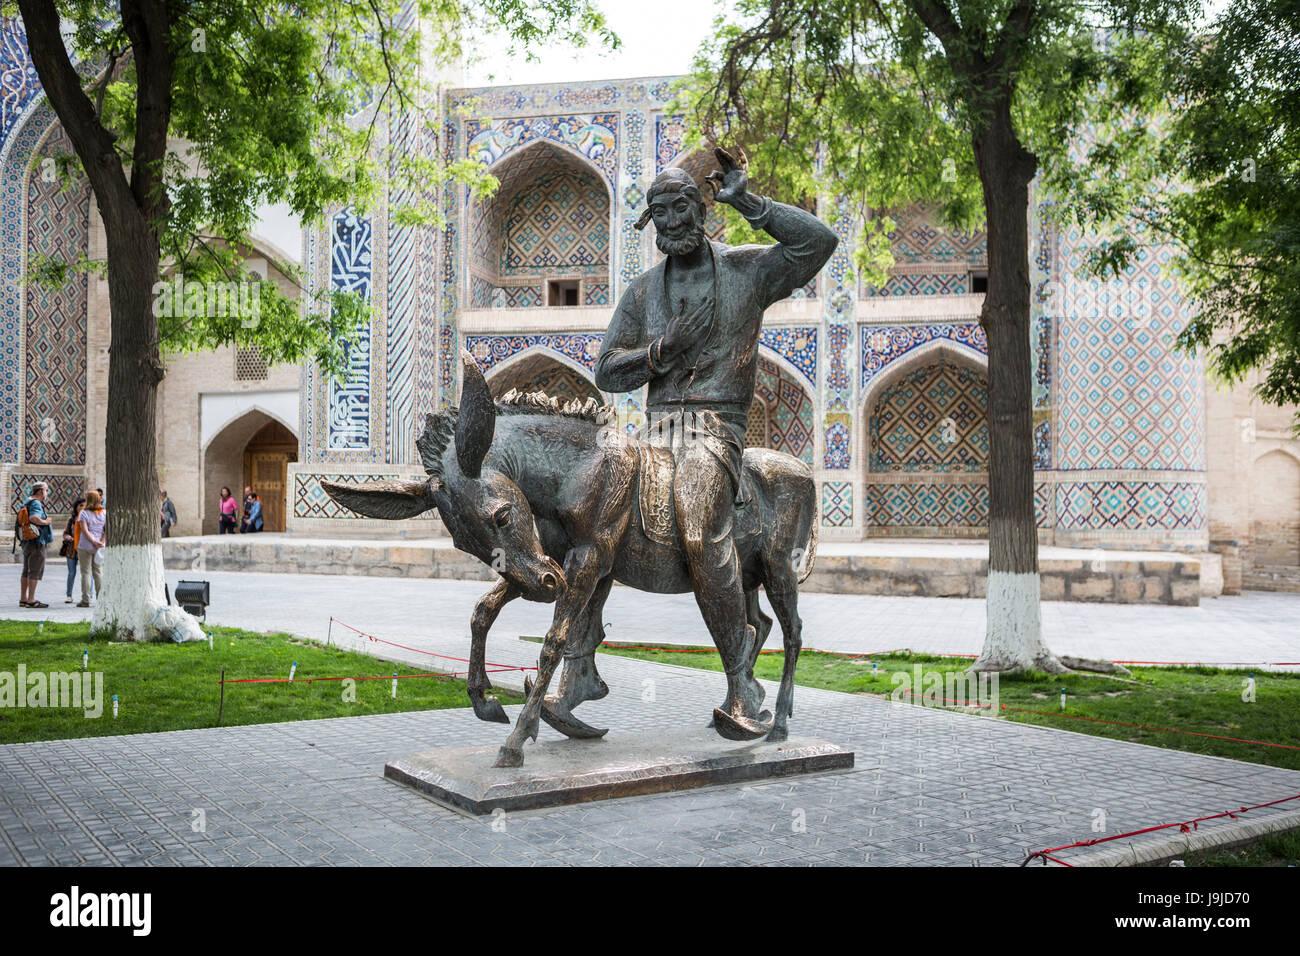 Uzbekistan, Bukhara City, Hoja Nasruddin Monument, (Sofi tales) - Stock Image